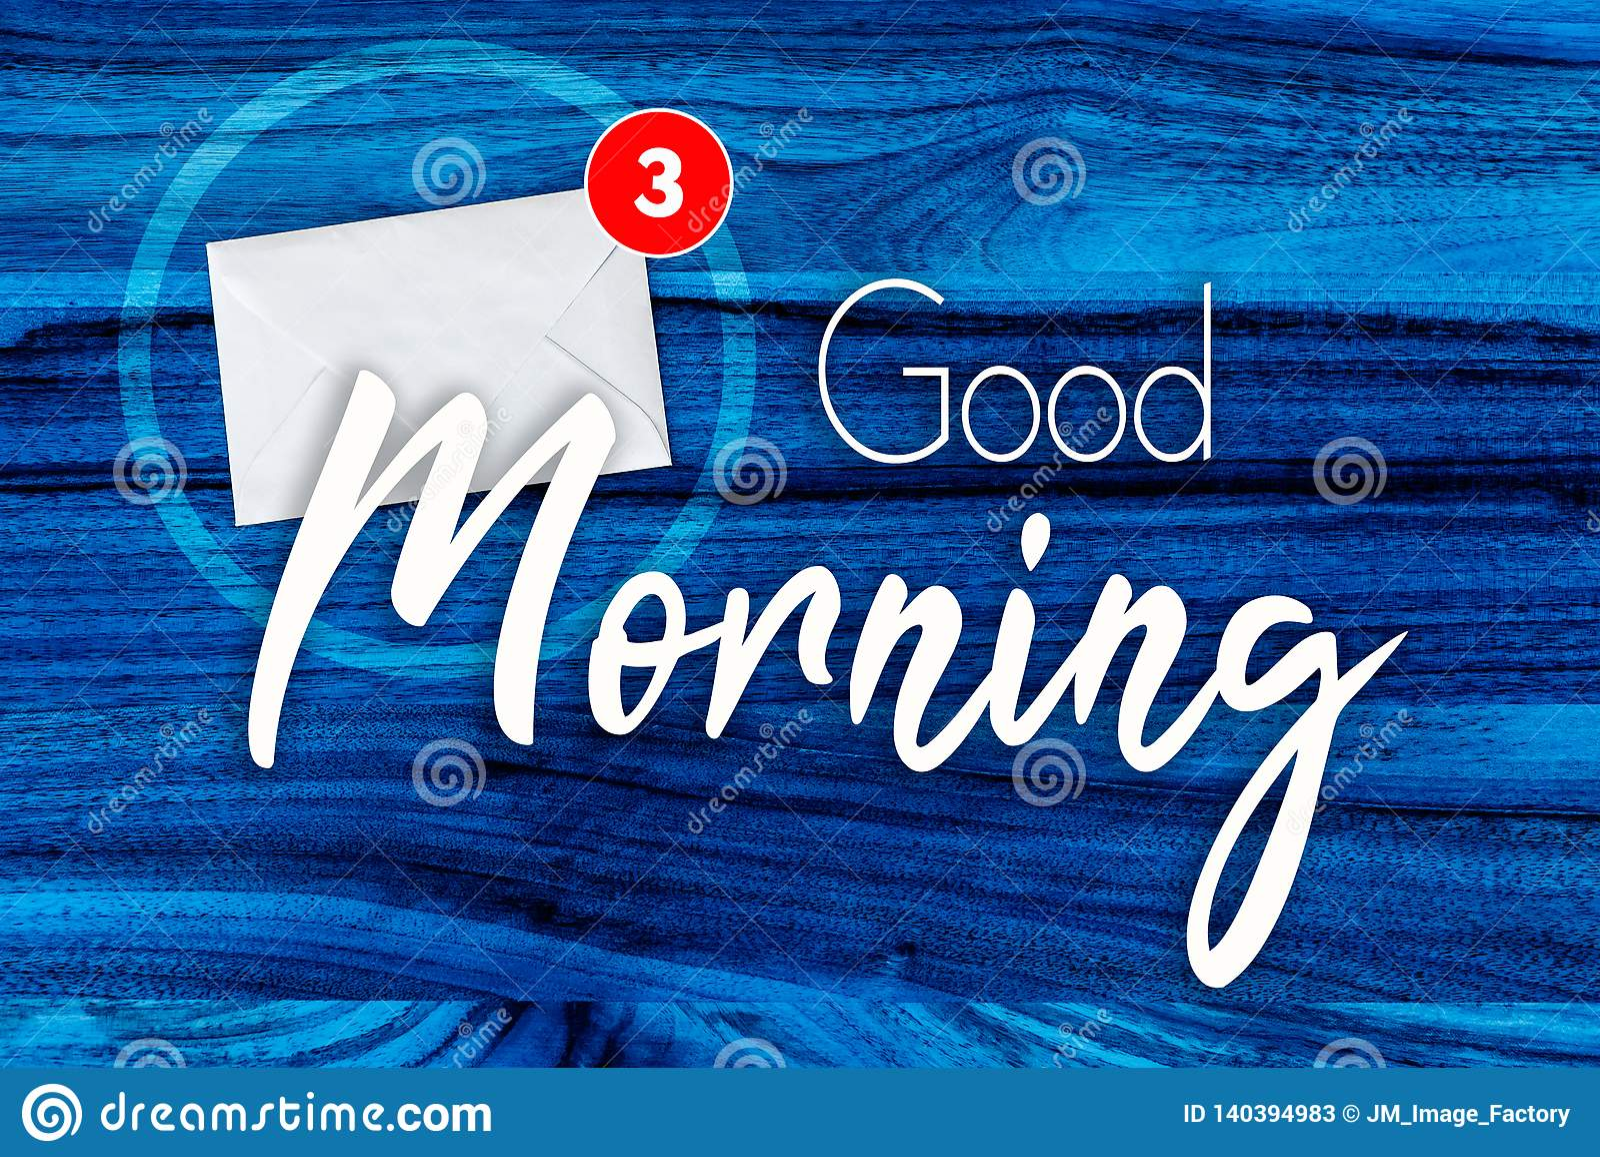 Концепция доброго утра в сини